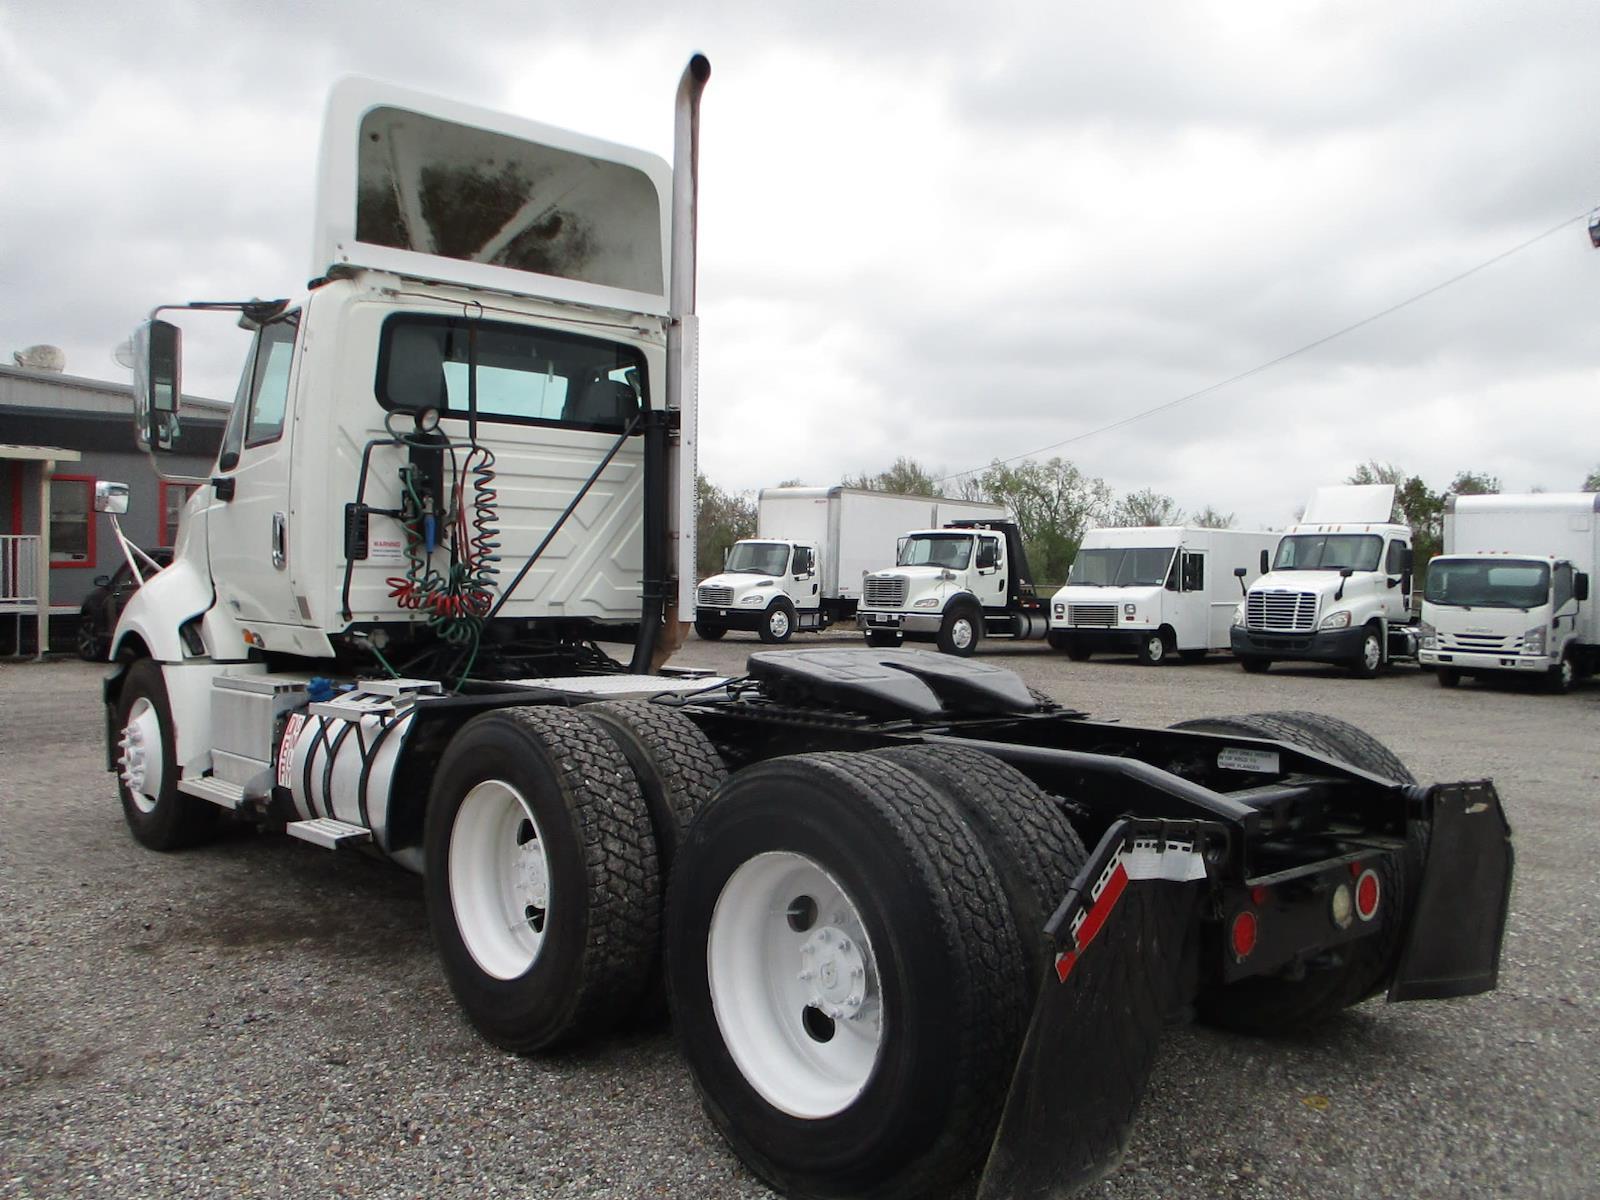 2015 International ProStar+ 6x4, Tractor #639362 - photo 1